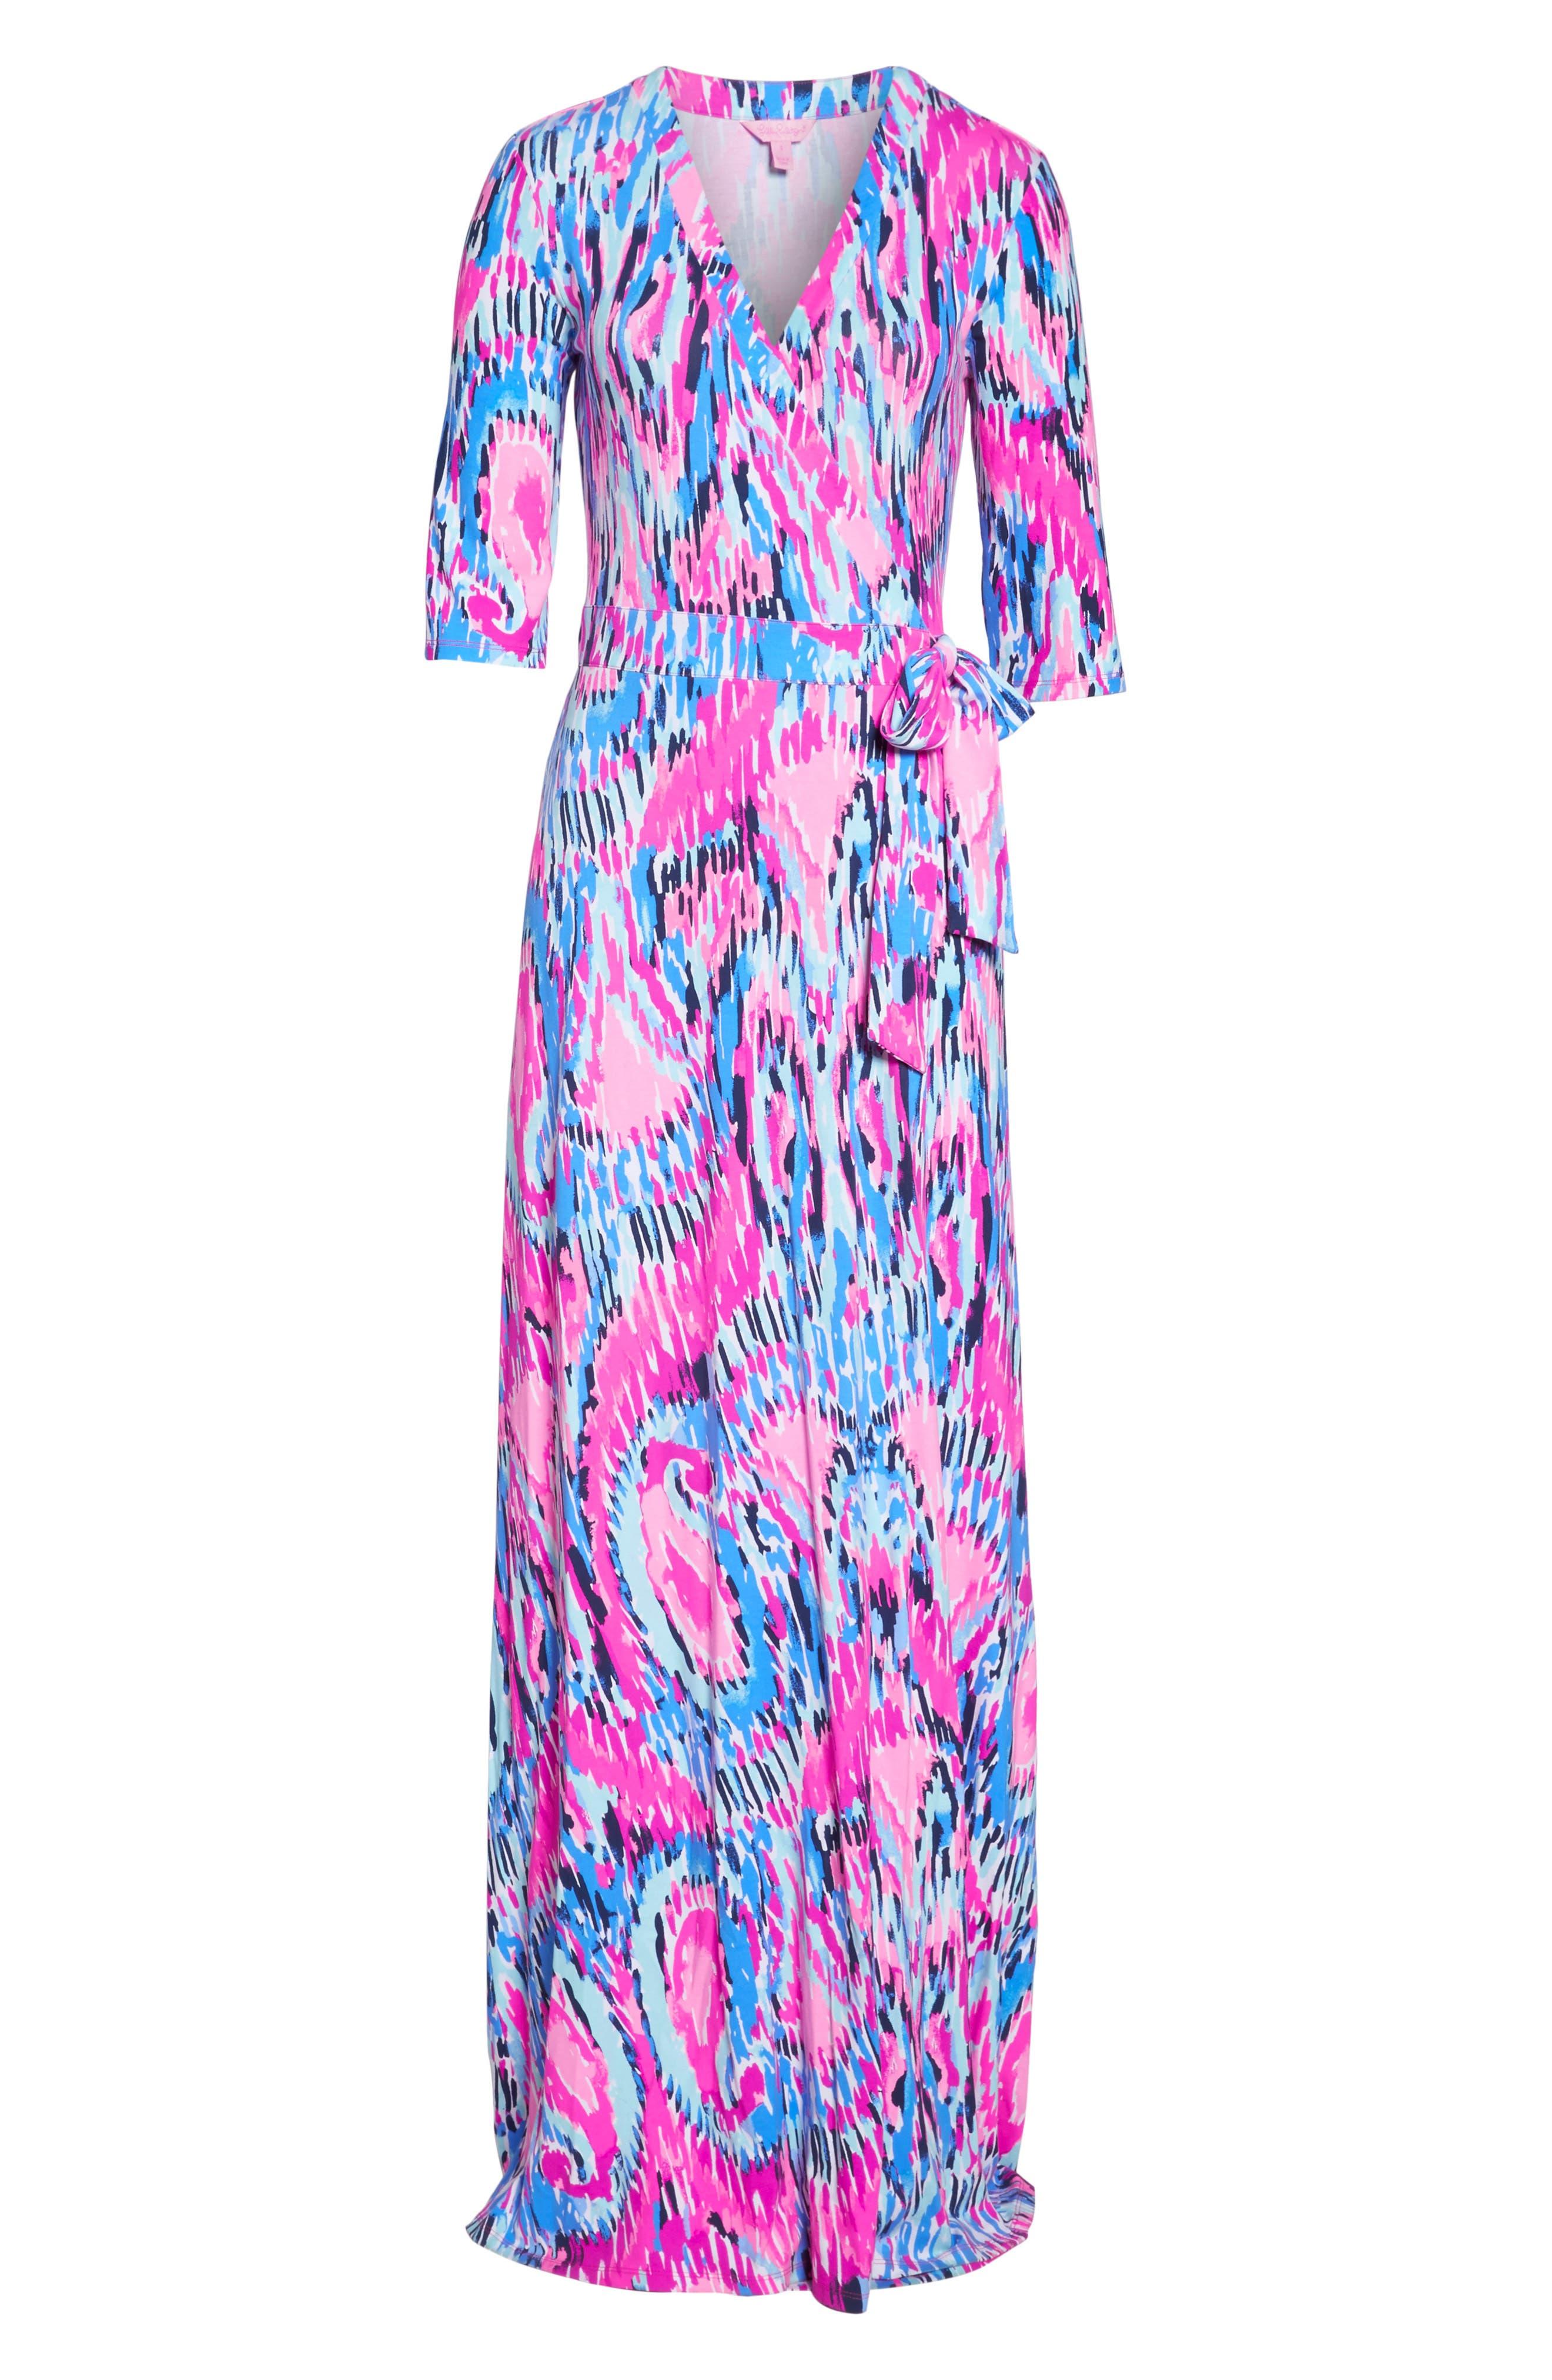 Marvista Wrap Maxi Dress,                             Alternate thumbnail 6, color,                             Multi Free Spirit